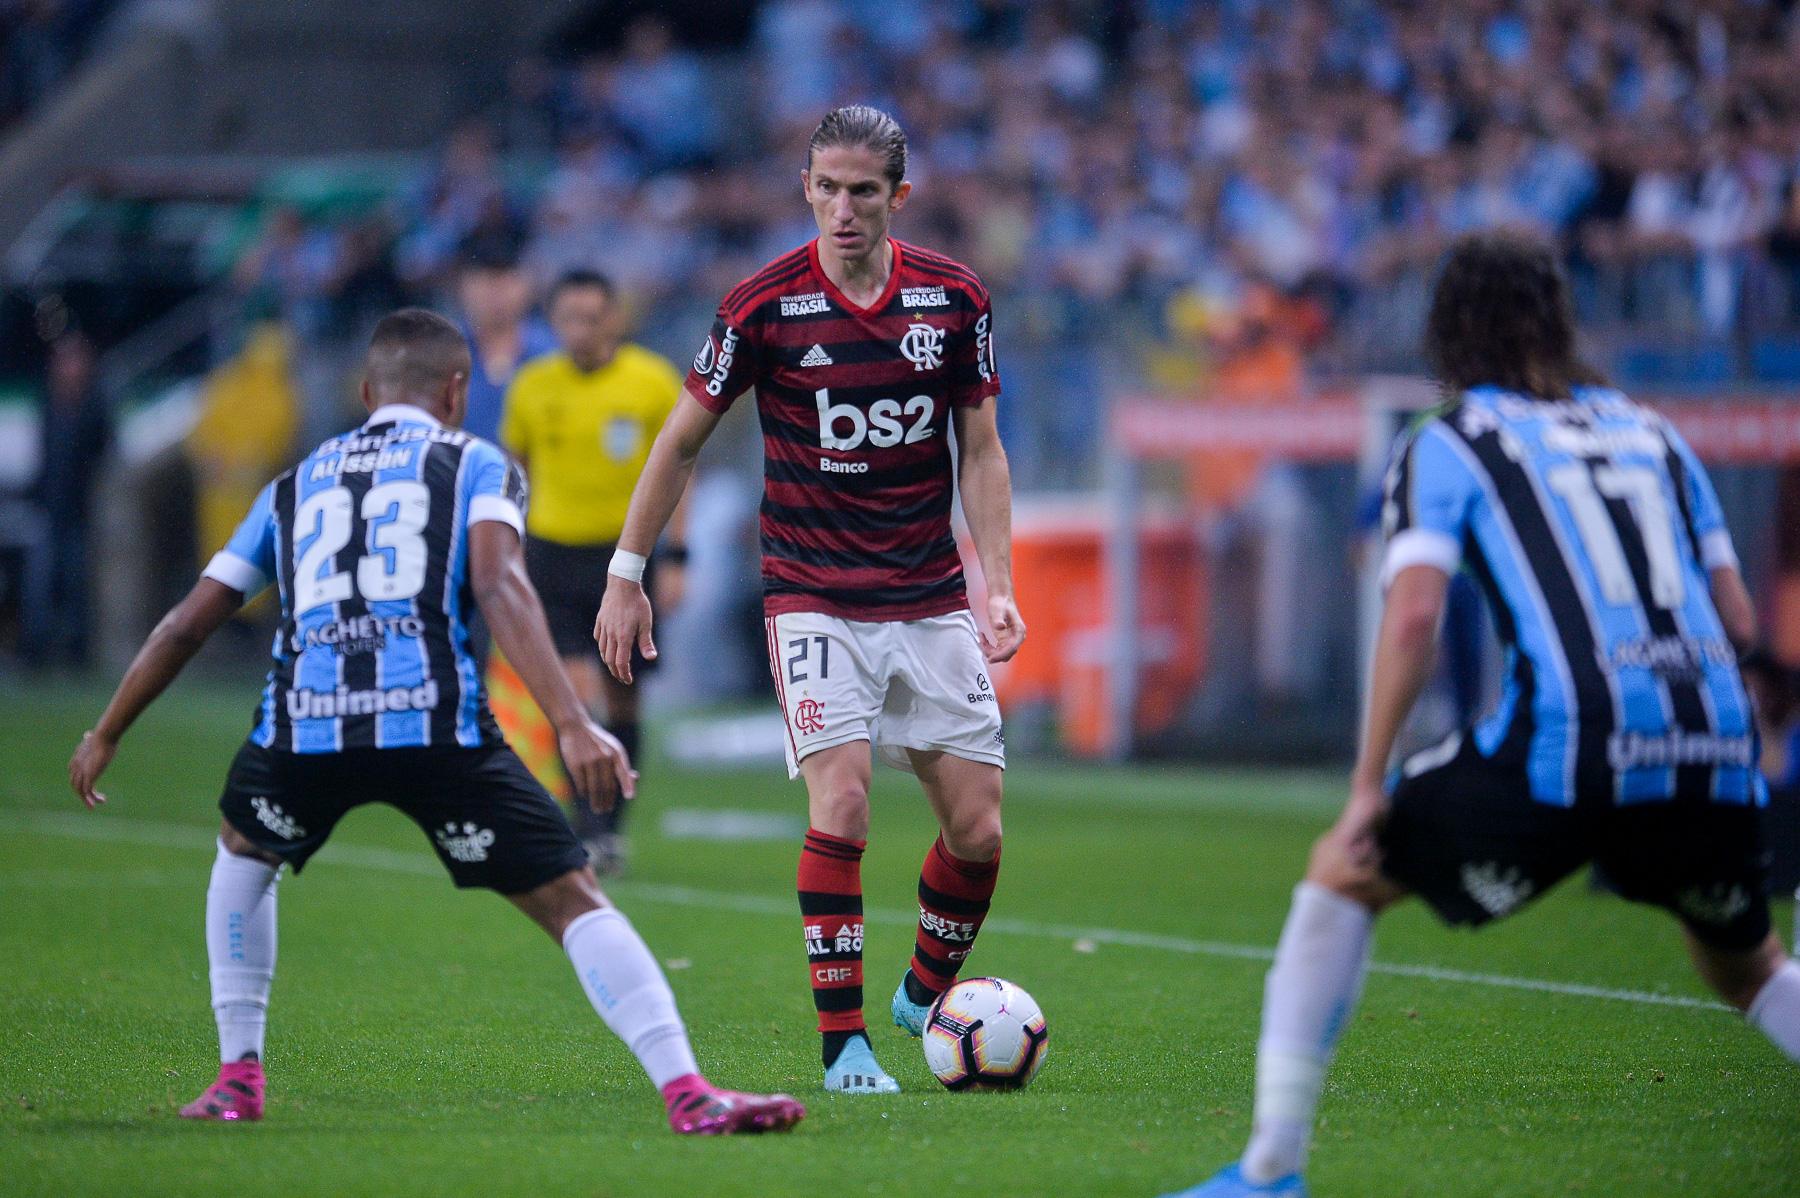 Gremio_X_Flamengo_dudabairros_Eleven_152